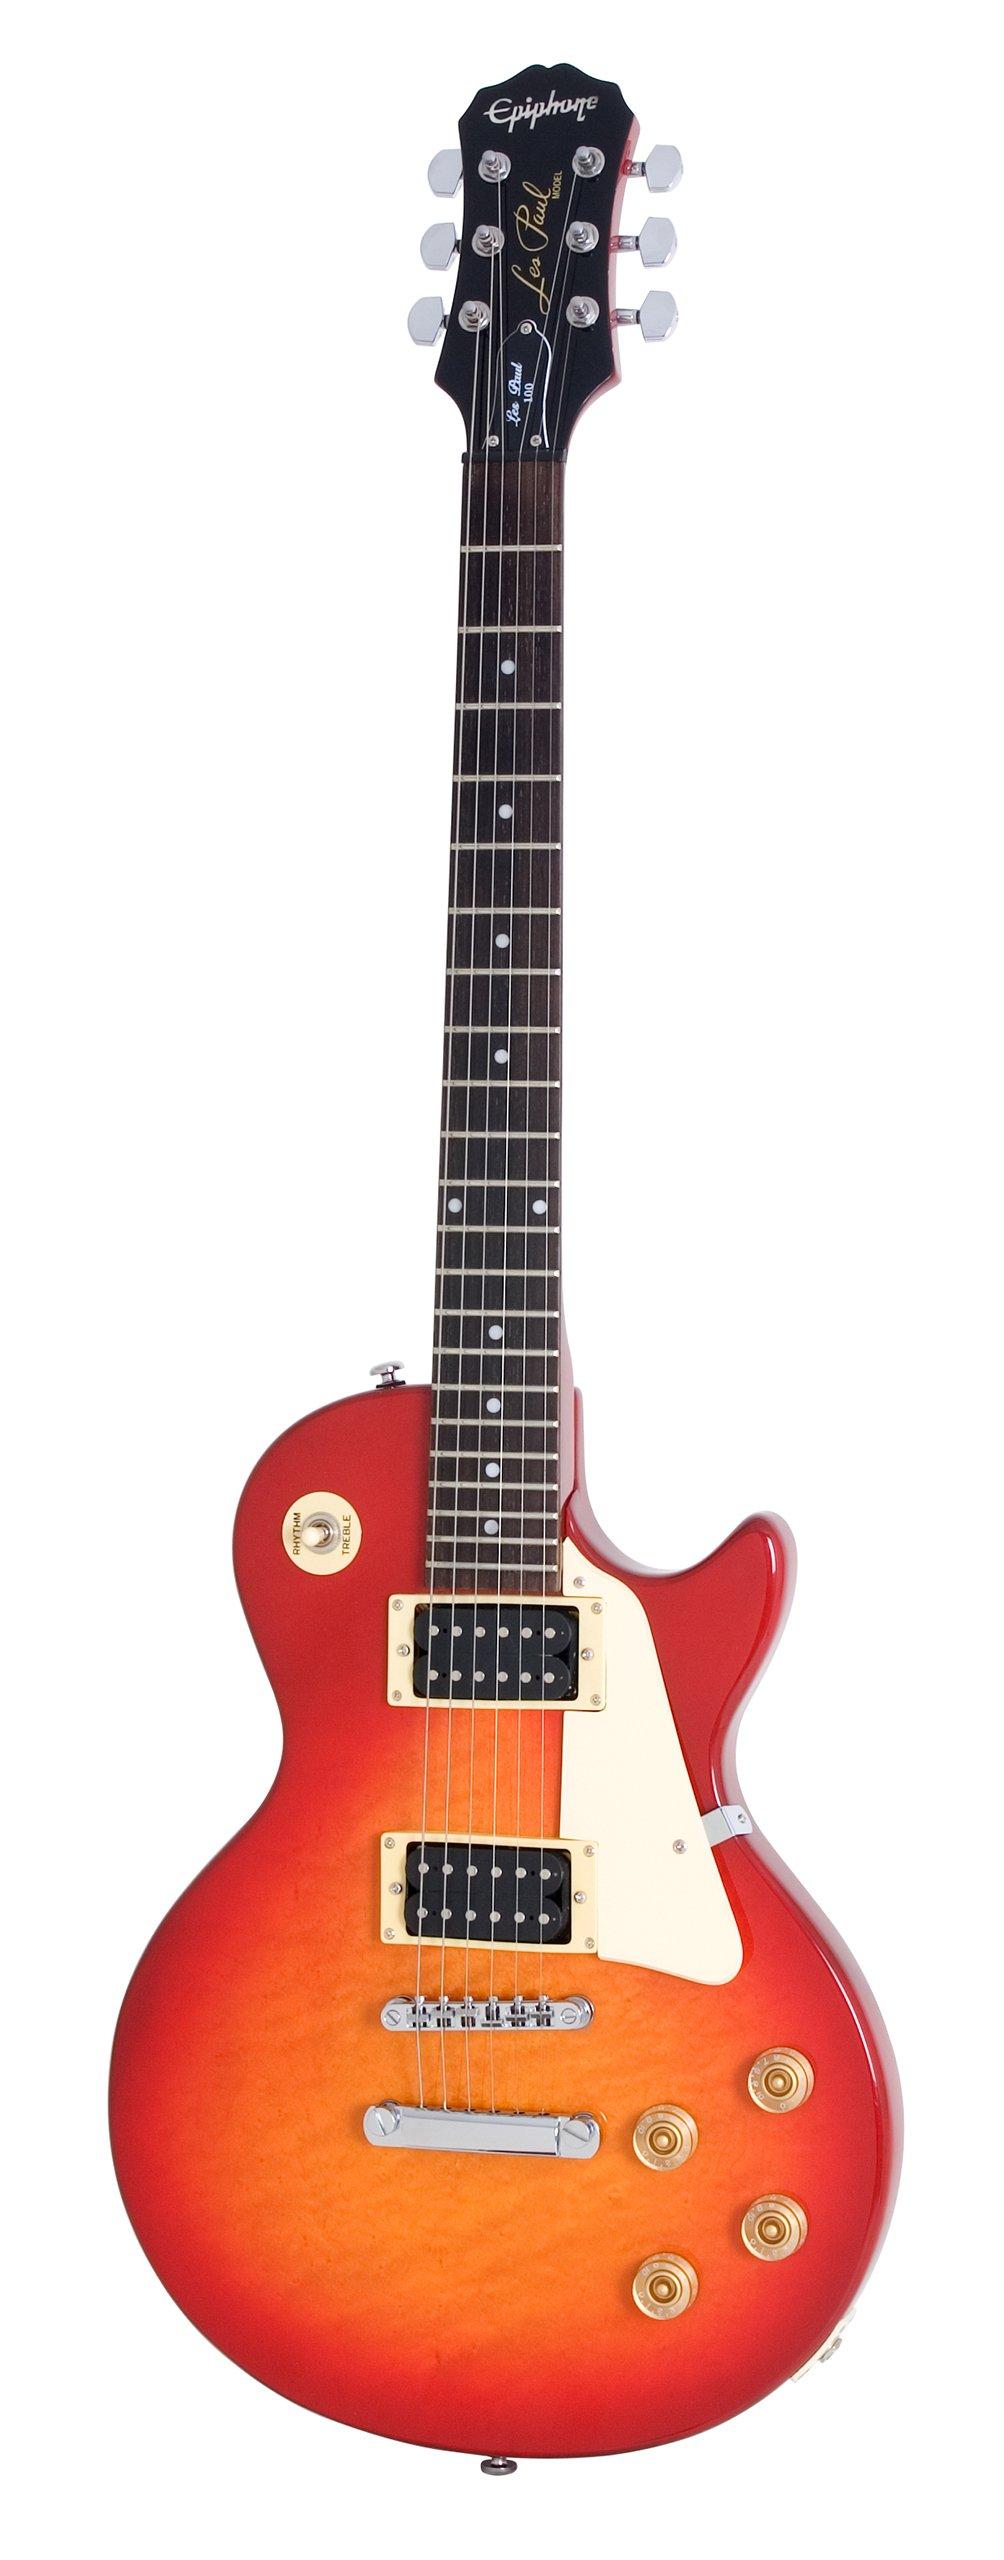 Epiphone Les Paul-100 Electric Guitar, Heritage Cherry Sunburst